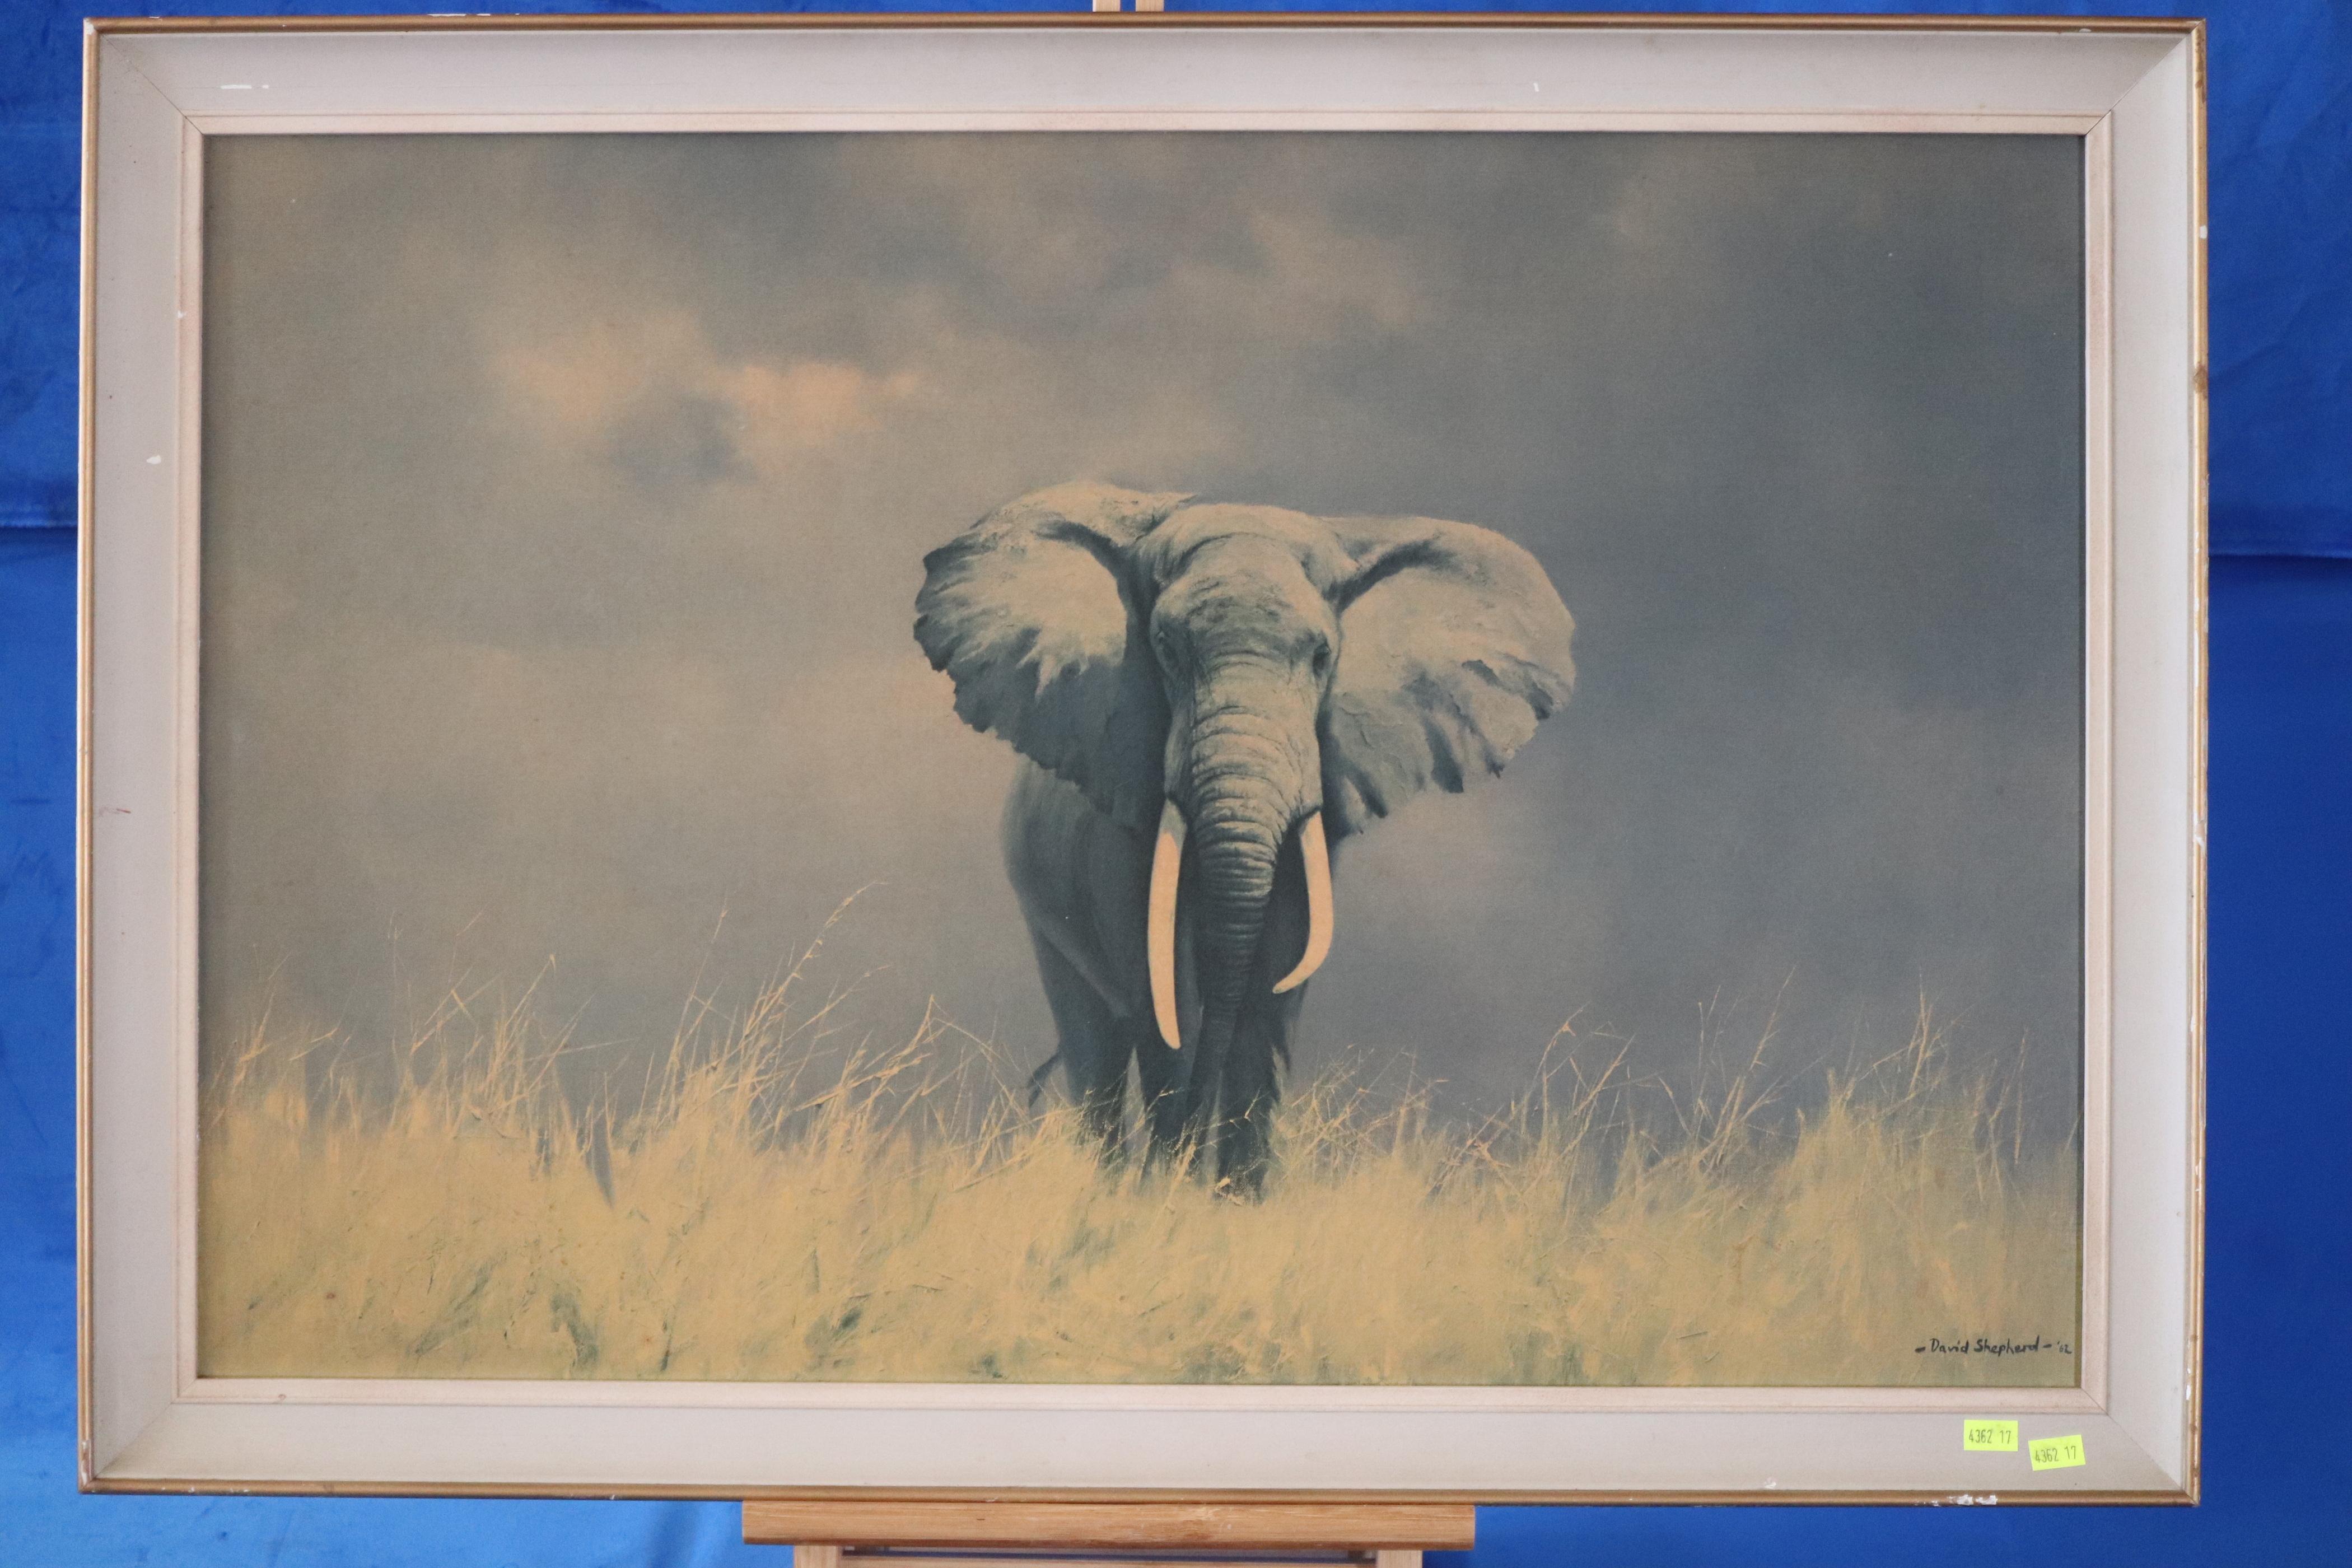 PRINT 'WISE OLD ELEPHANT' BY DAVID SHEPHERD